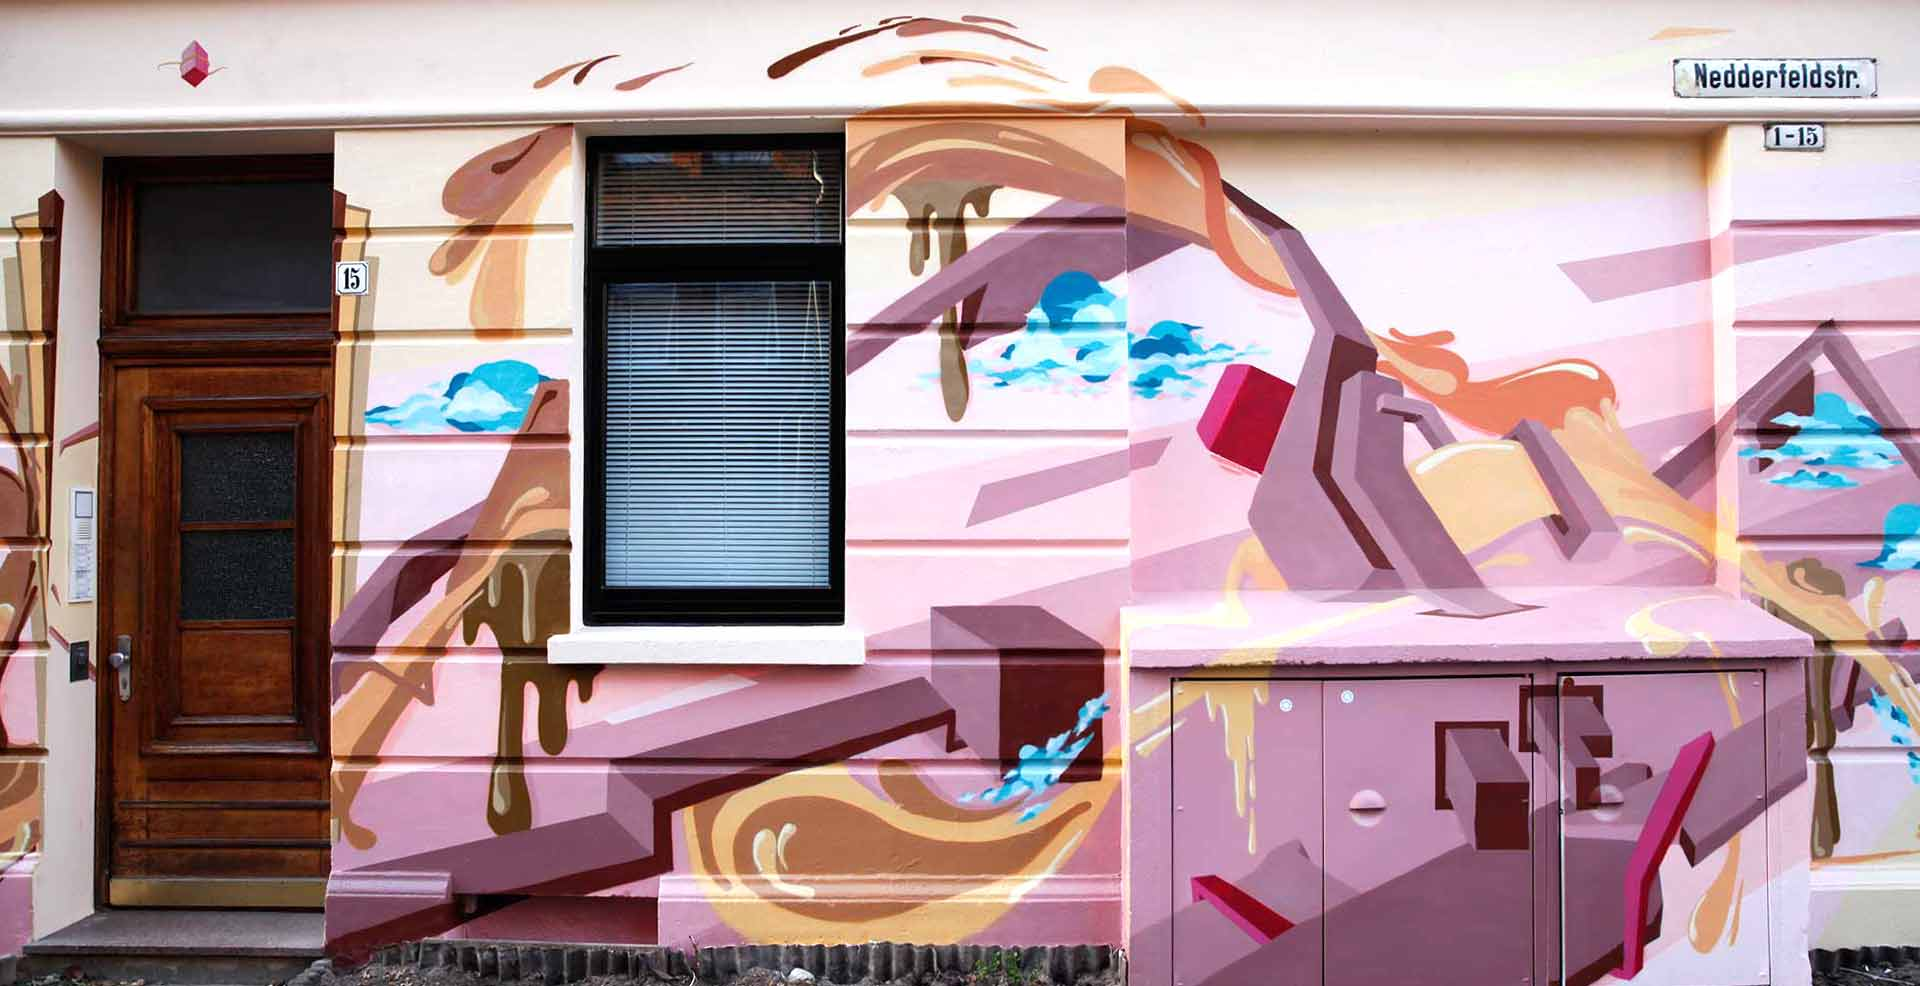 Nedderfeldstrasse Linden Nord Graffiti